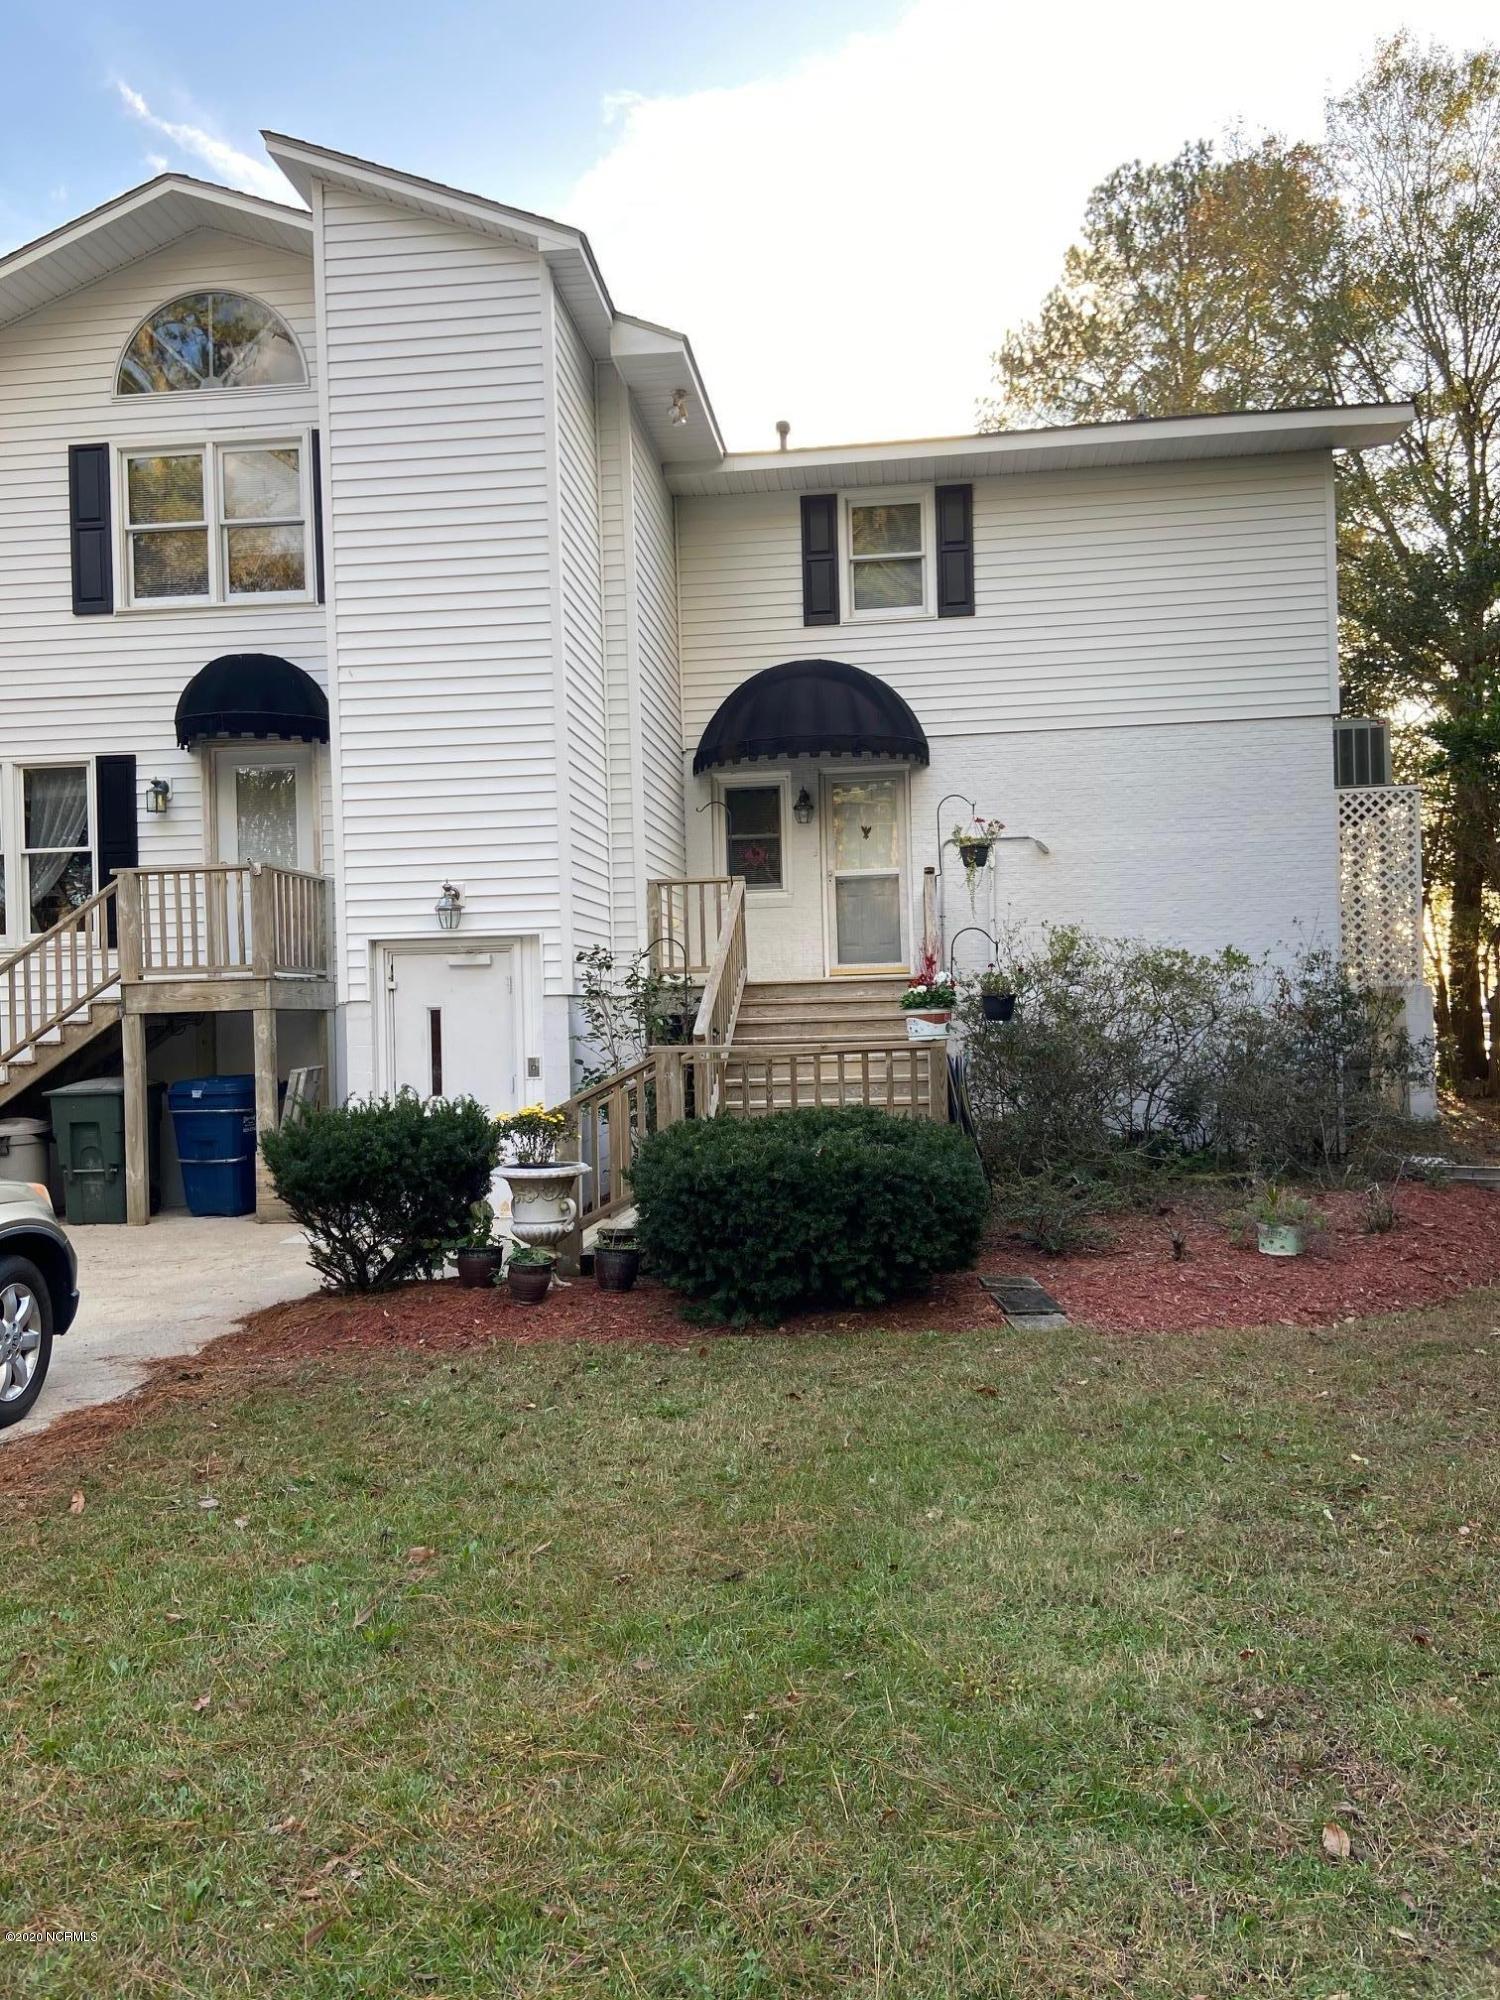 308 Sunnyside Drive, Washington, North Carolina 27889, 3 Bedrooms Bedrooms, 9 Rooms Rooms,2 BathroomsBathrooms,Single family residence,For sale,Sunnyside,100251465